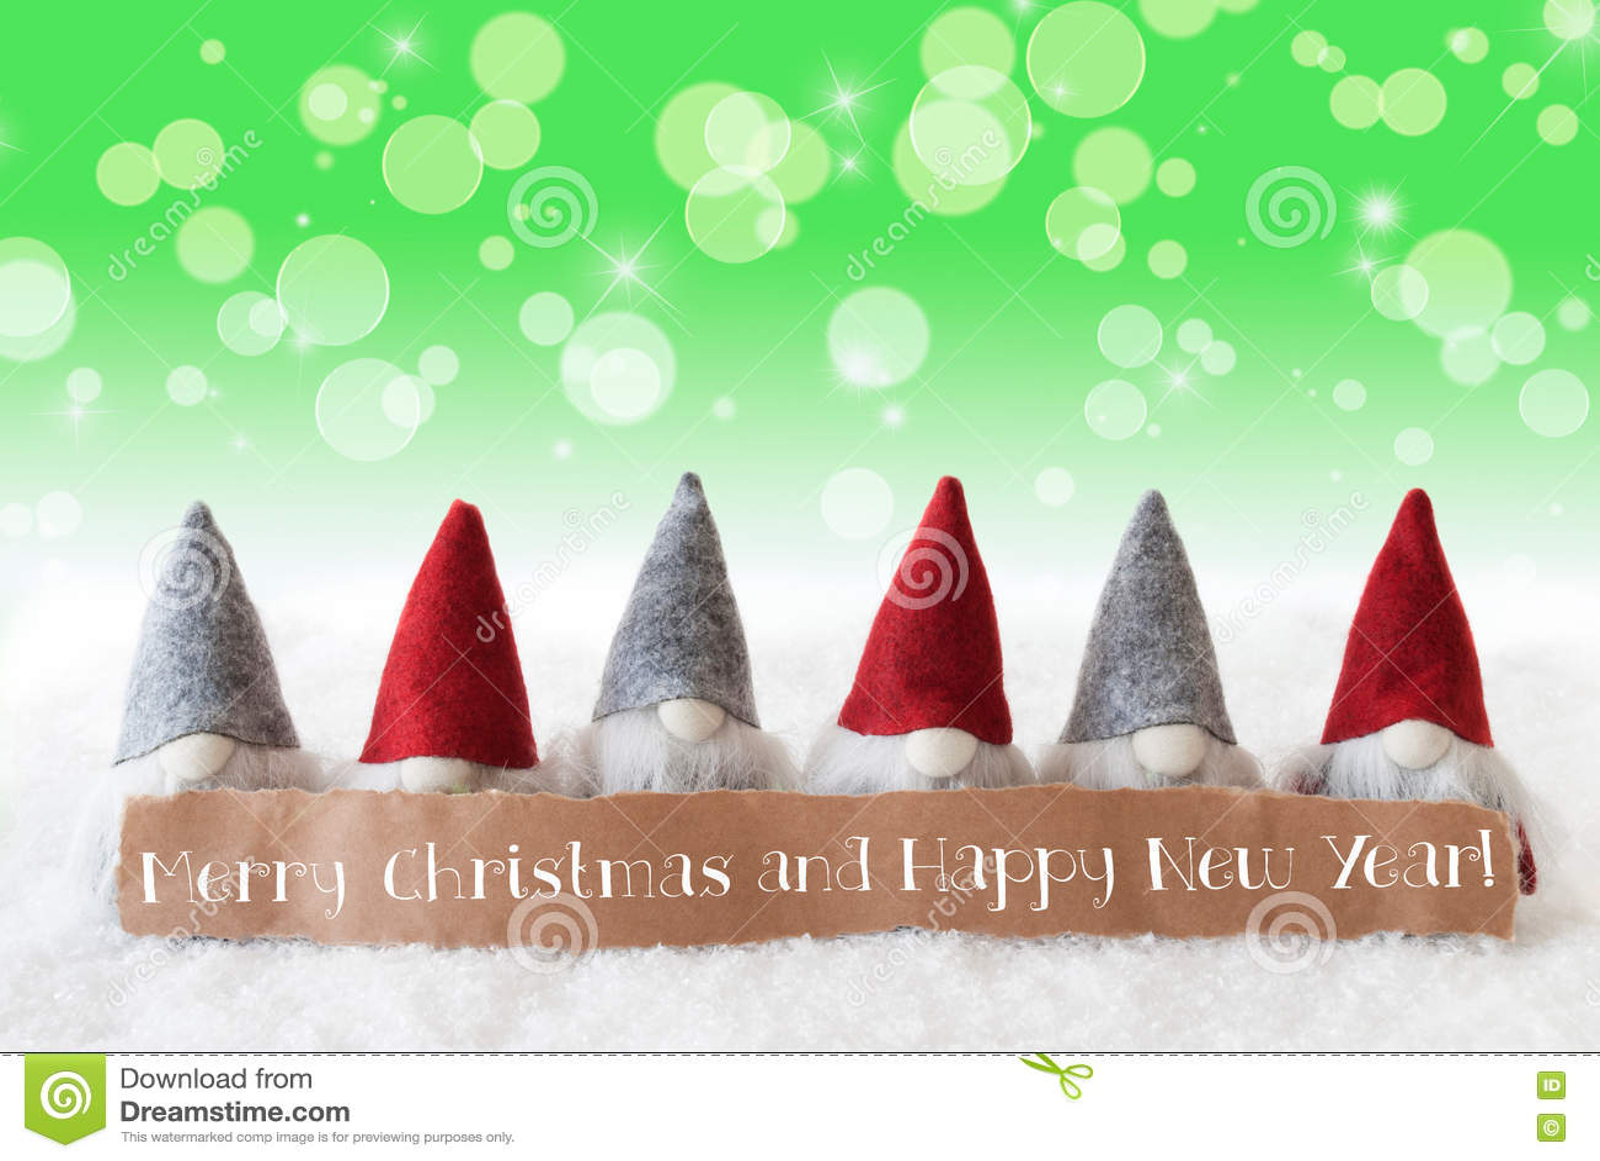 Gnomos, Bokeh verde, estrelas, Feliz Natal e ano novo feliz